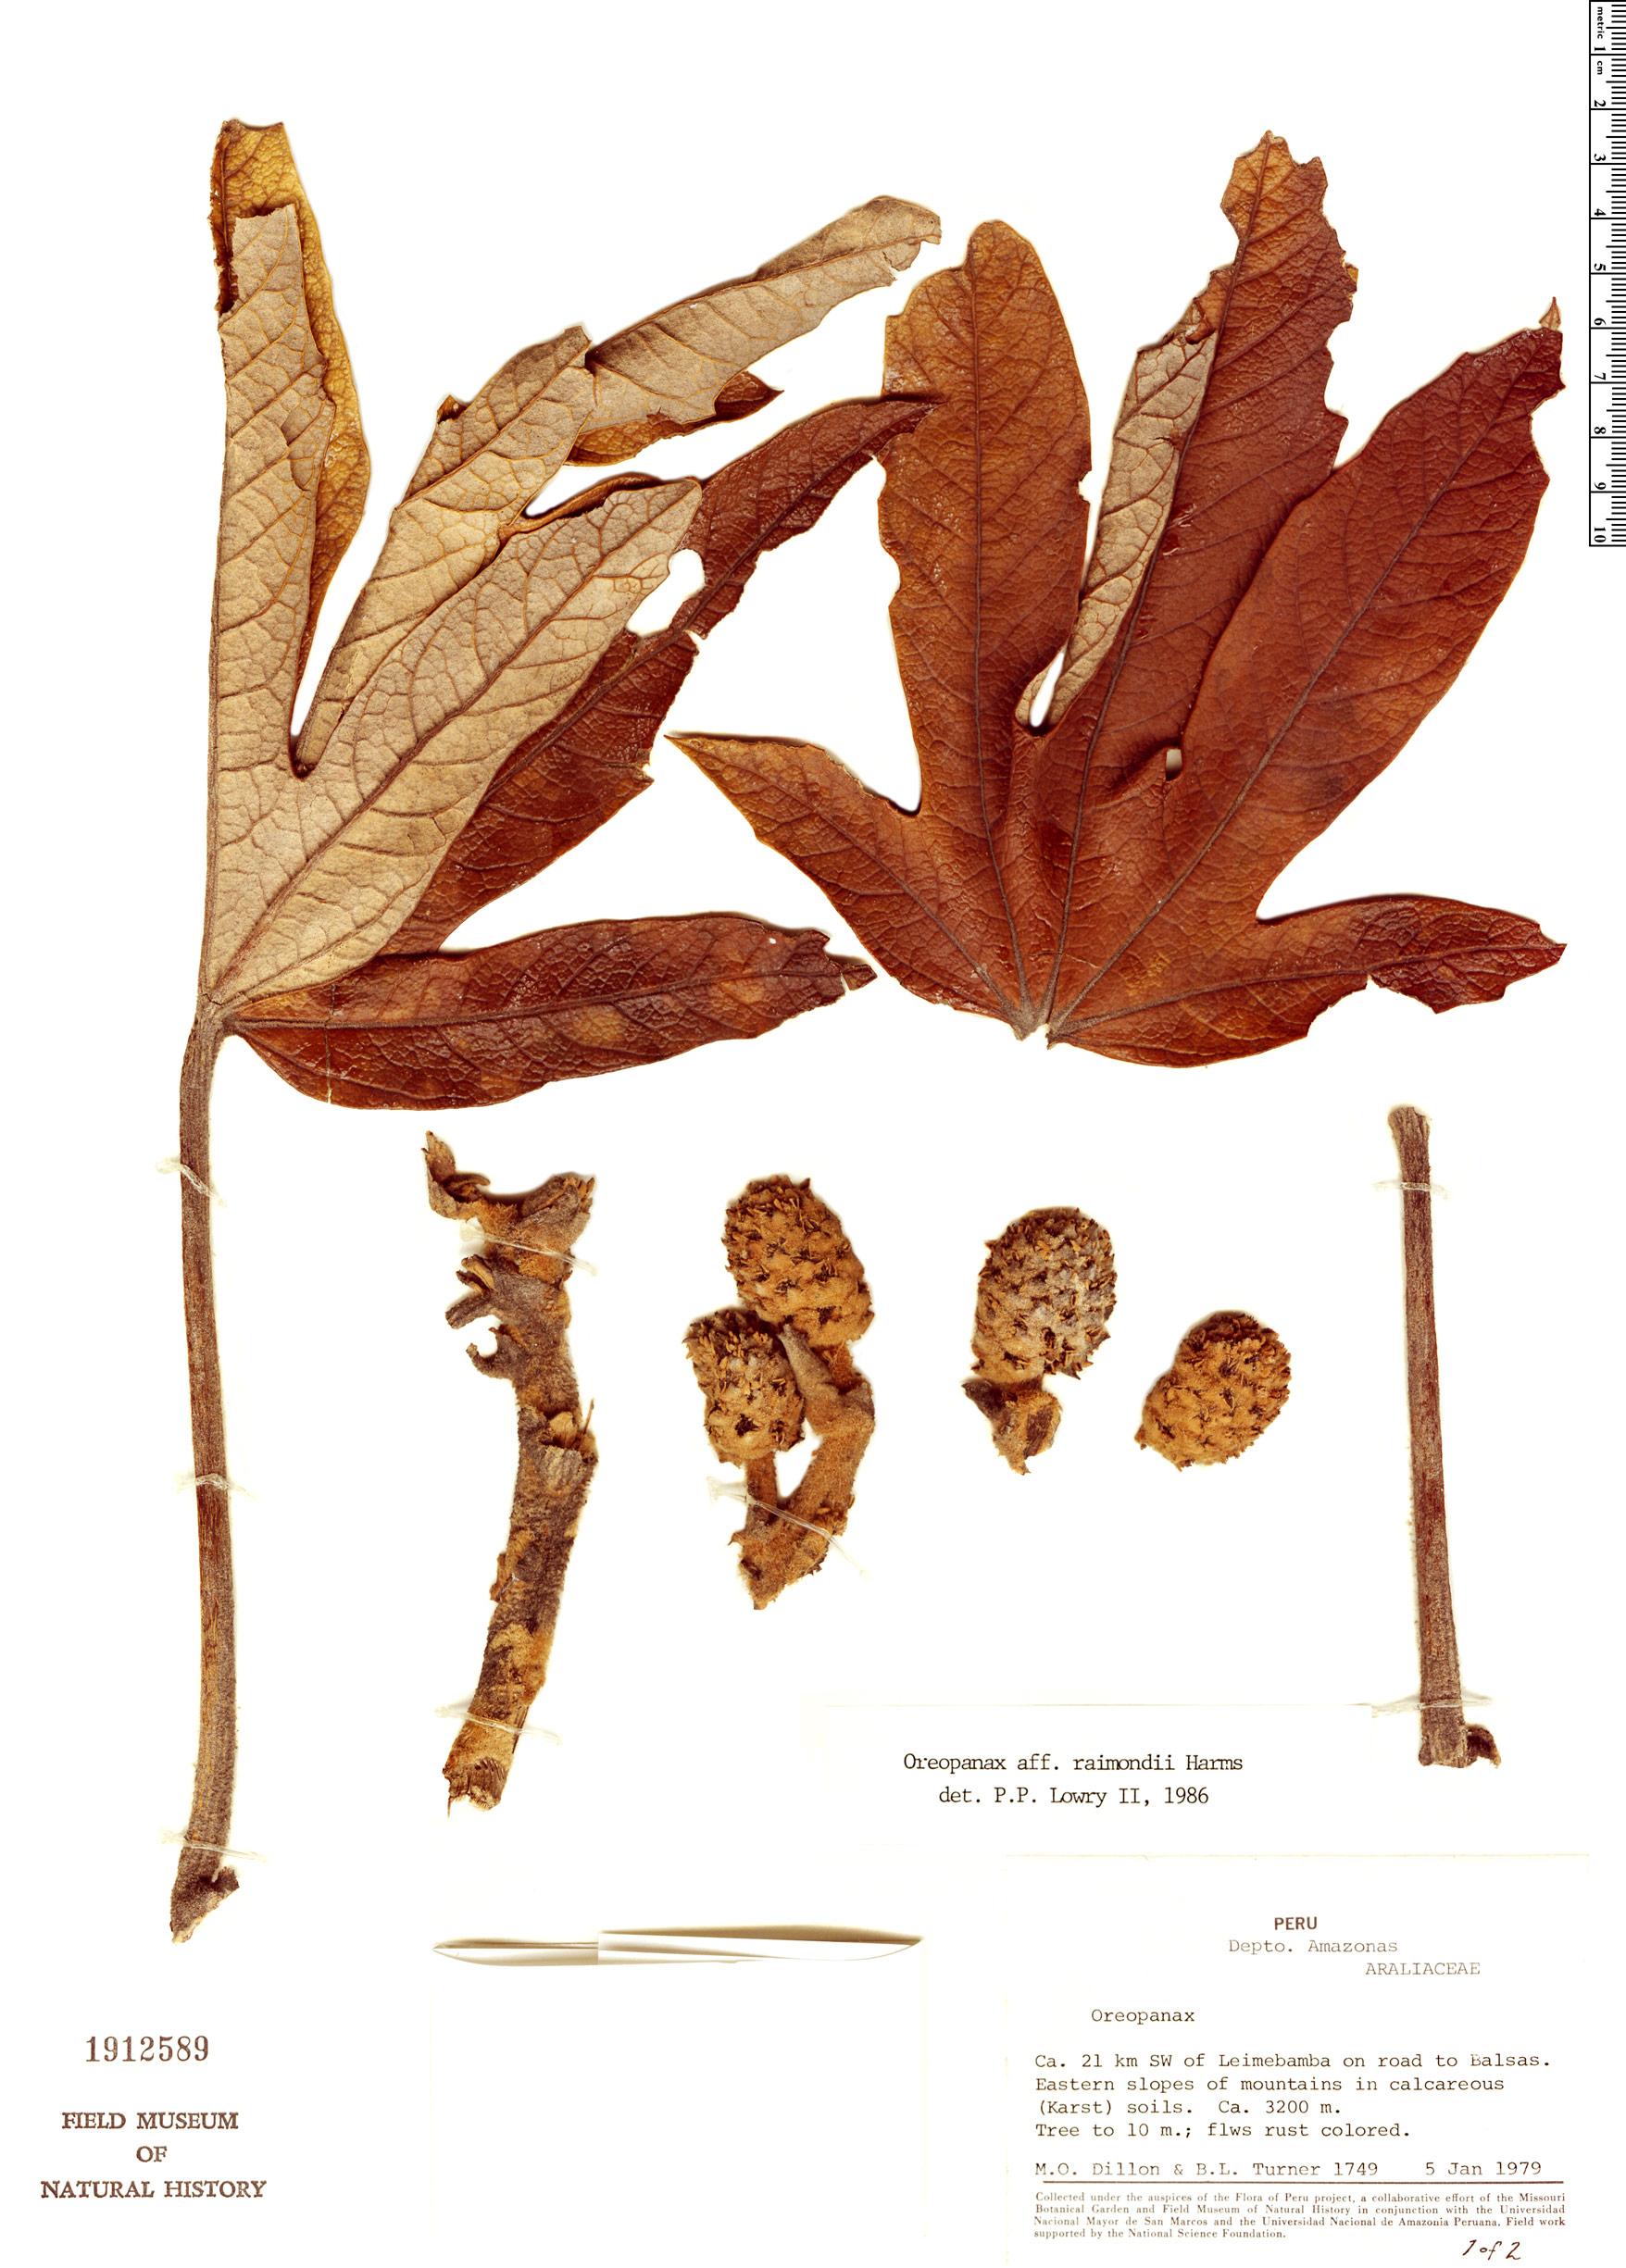 Specimen: Oreopanax raimondii